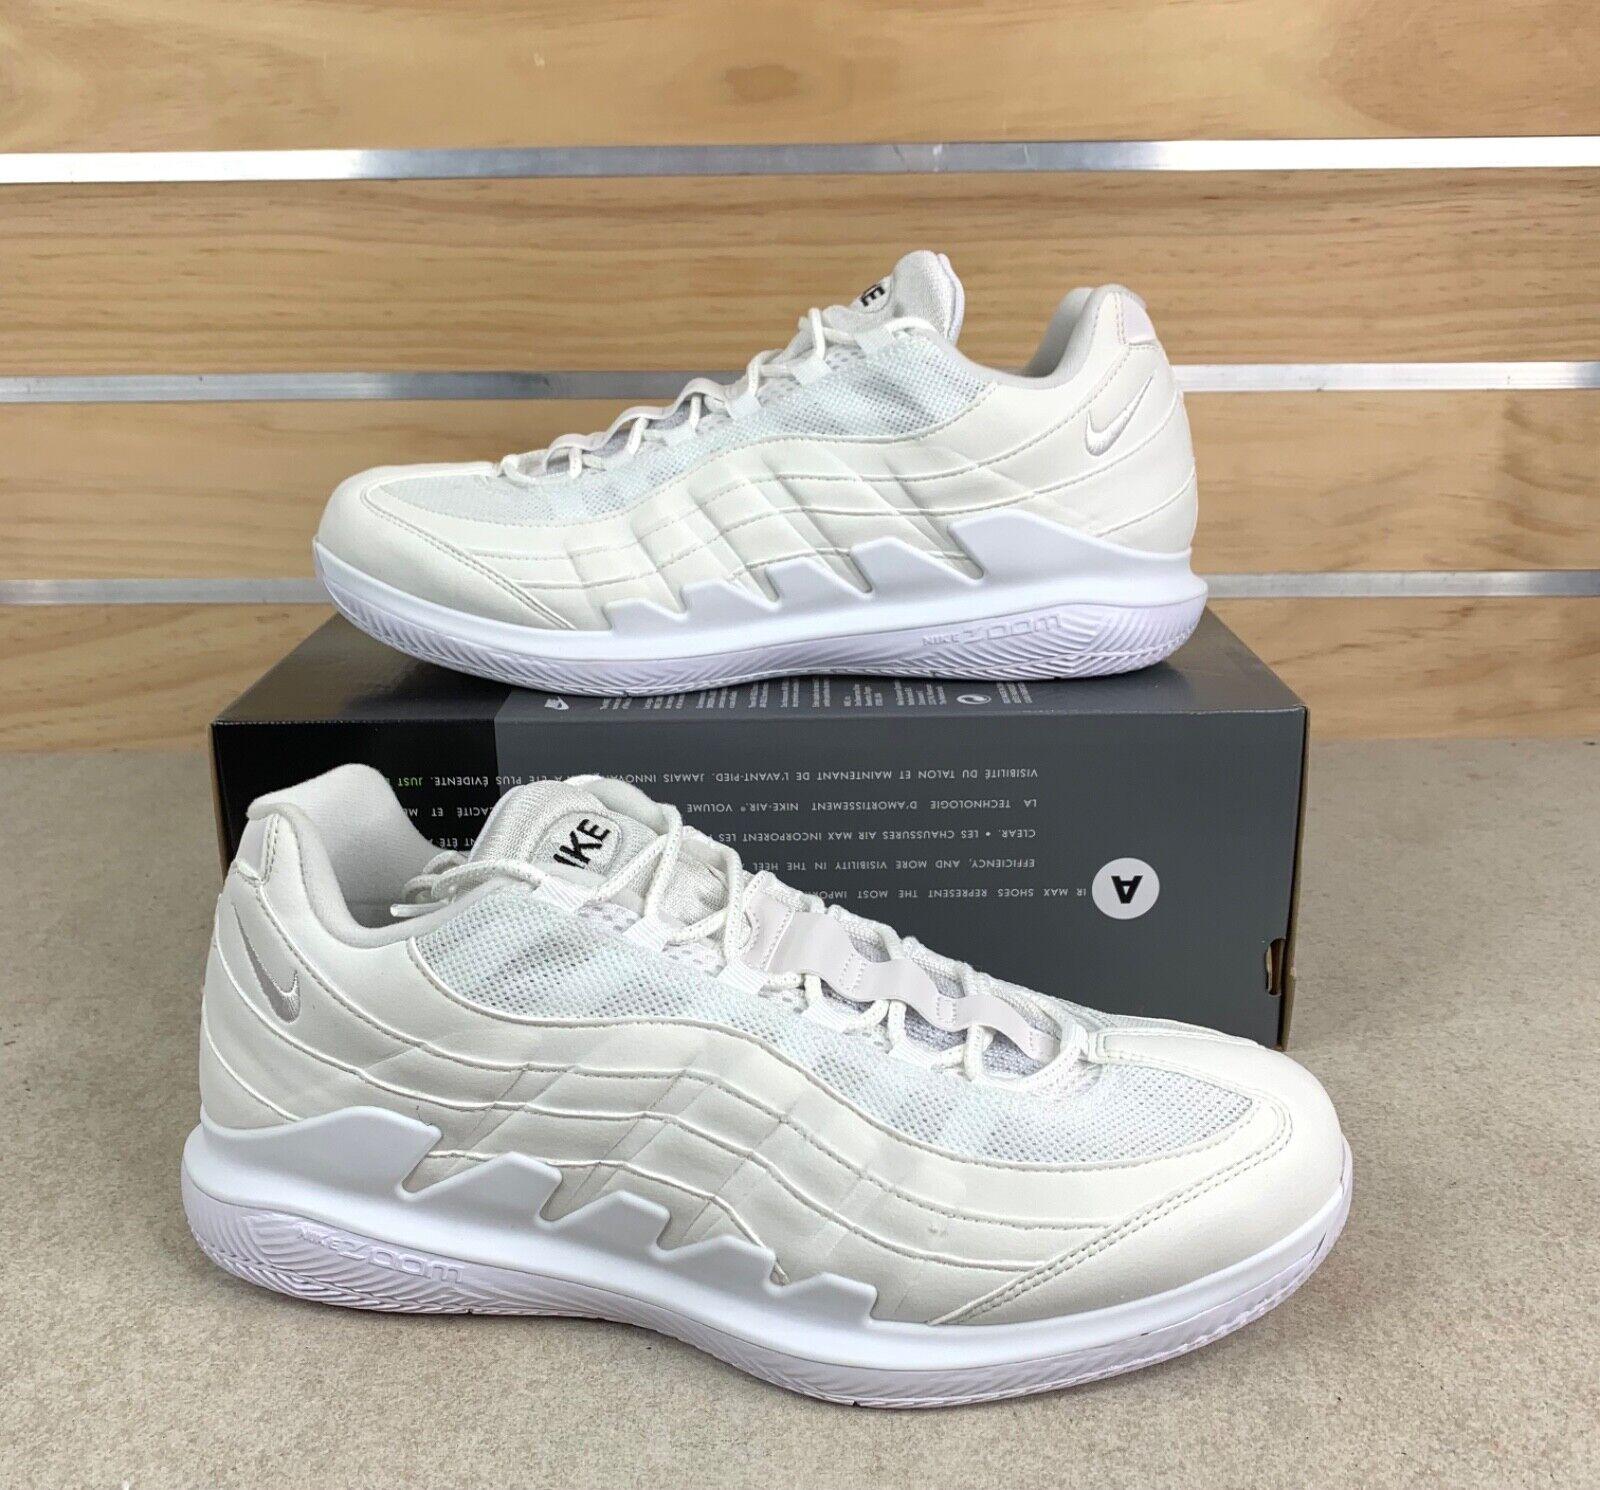 Size 11 - Nike Court Zoom Vapor X Air Max 95 Triple White 2020 for ...